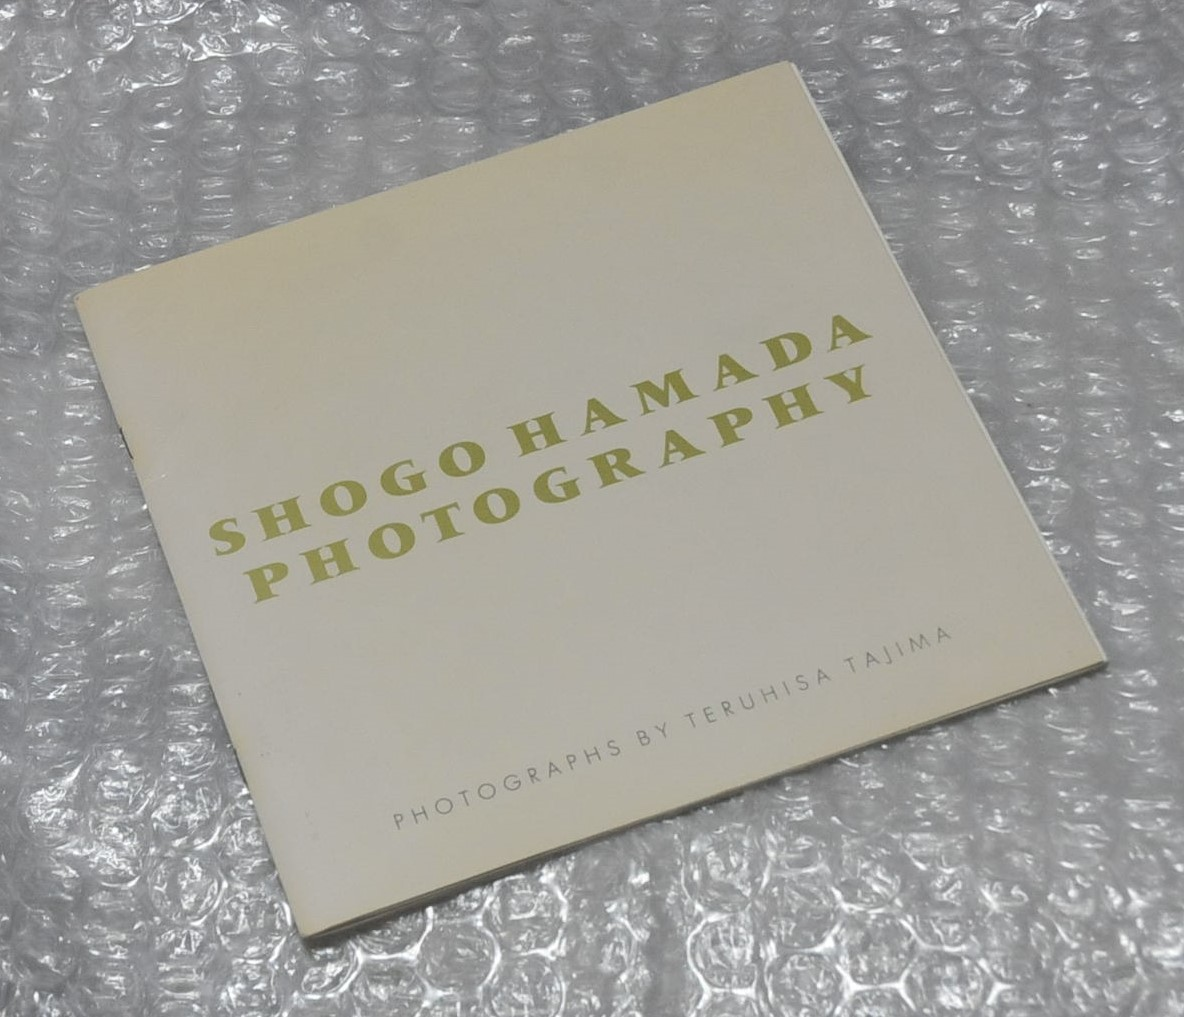 shogo hamada photography 田島照久 / 浜田省吾 FC限定 写真集 ライブグッズの画像